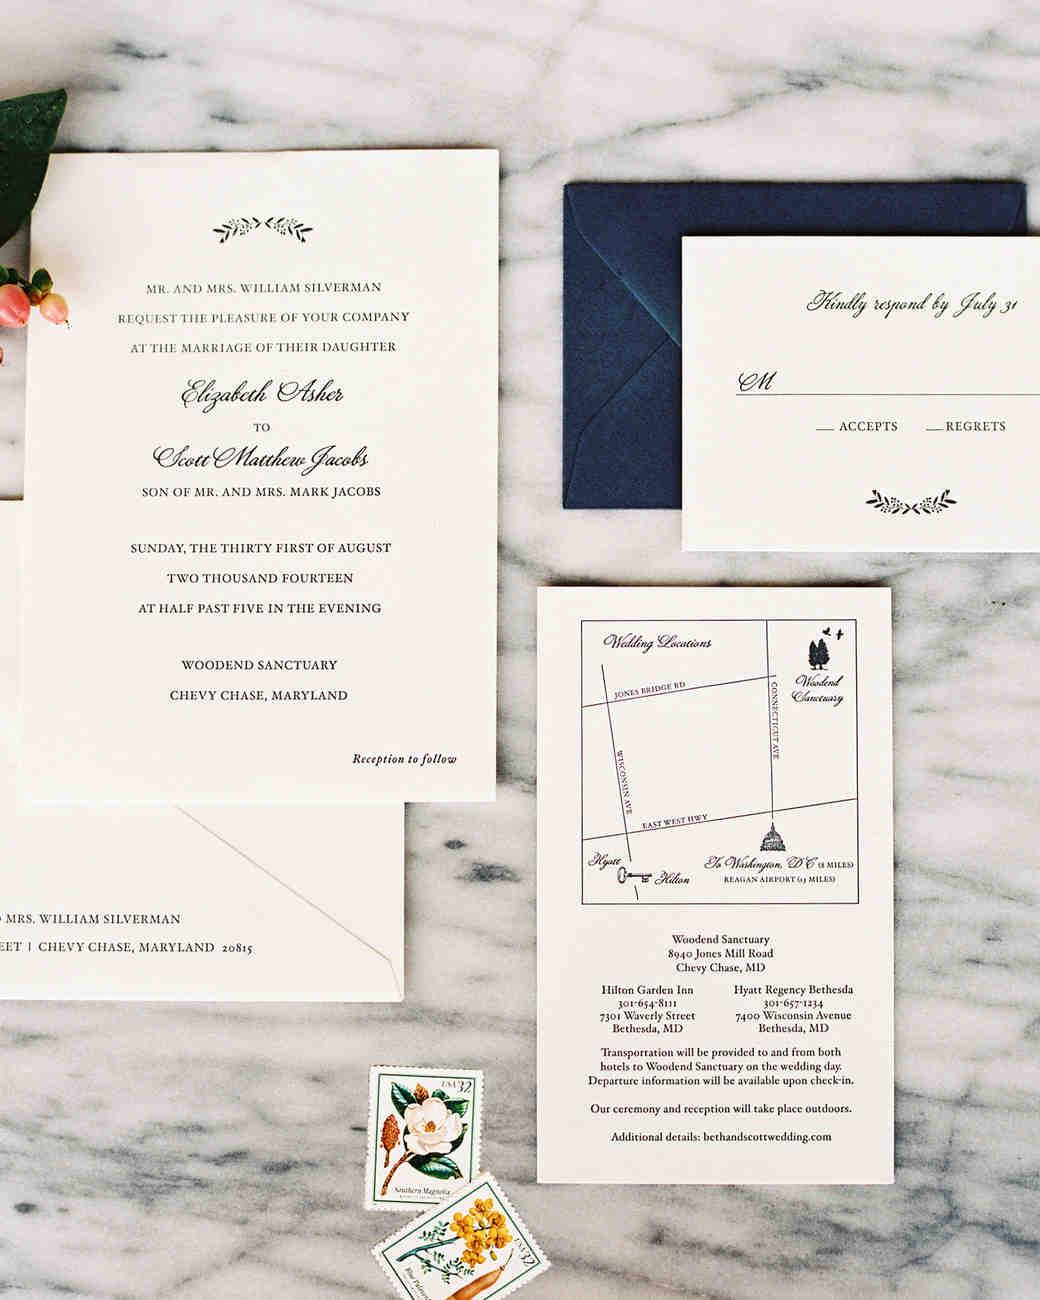 beth-scott-wedding-invite-0225-s112077-0715.jpg